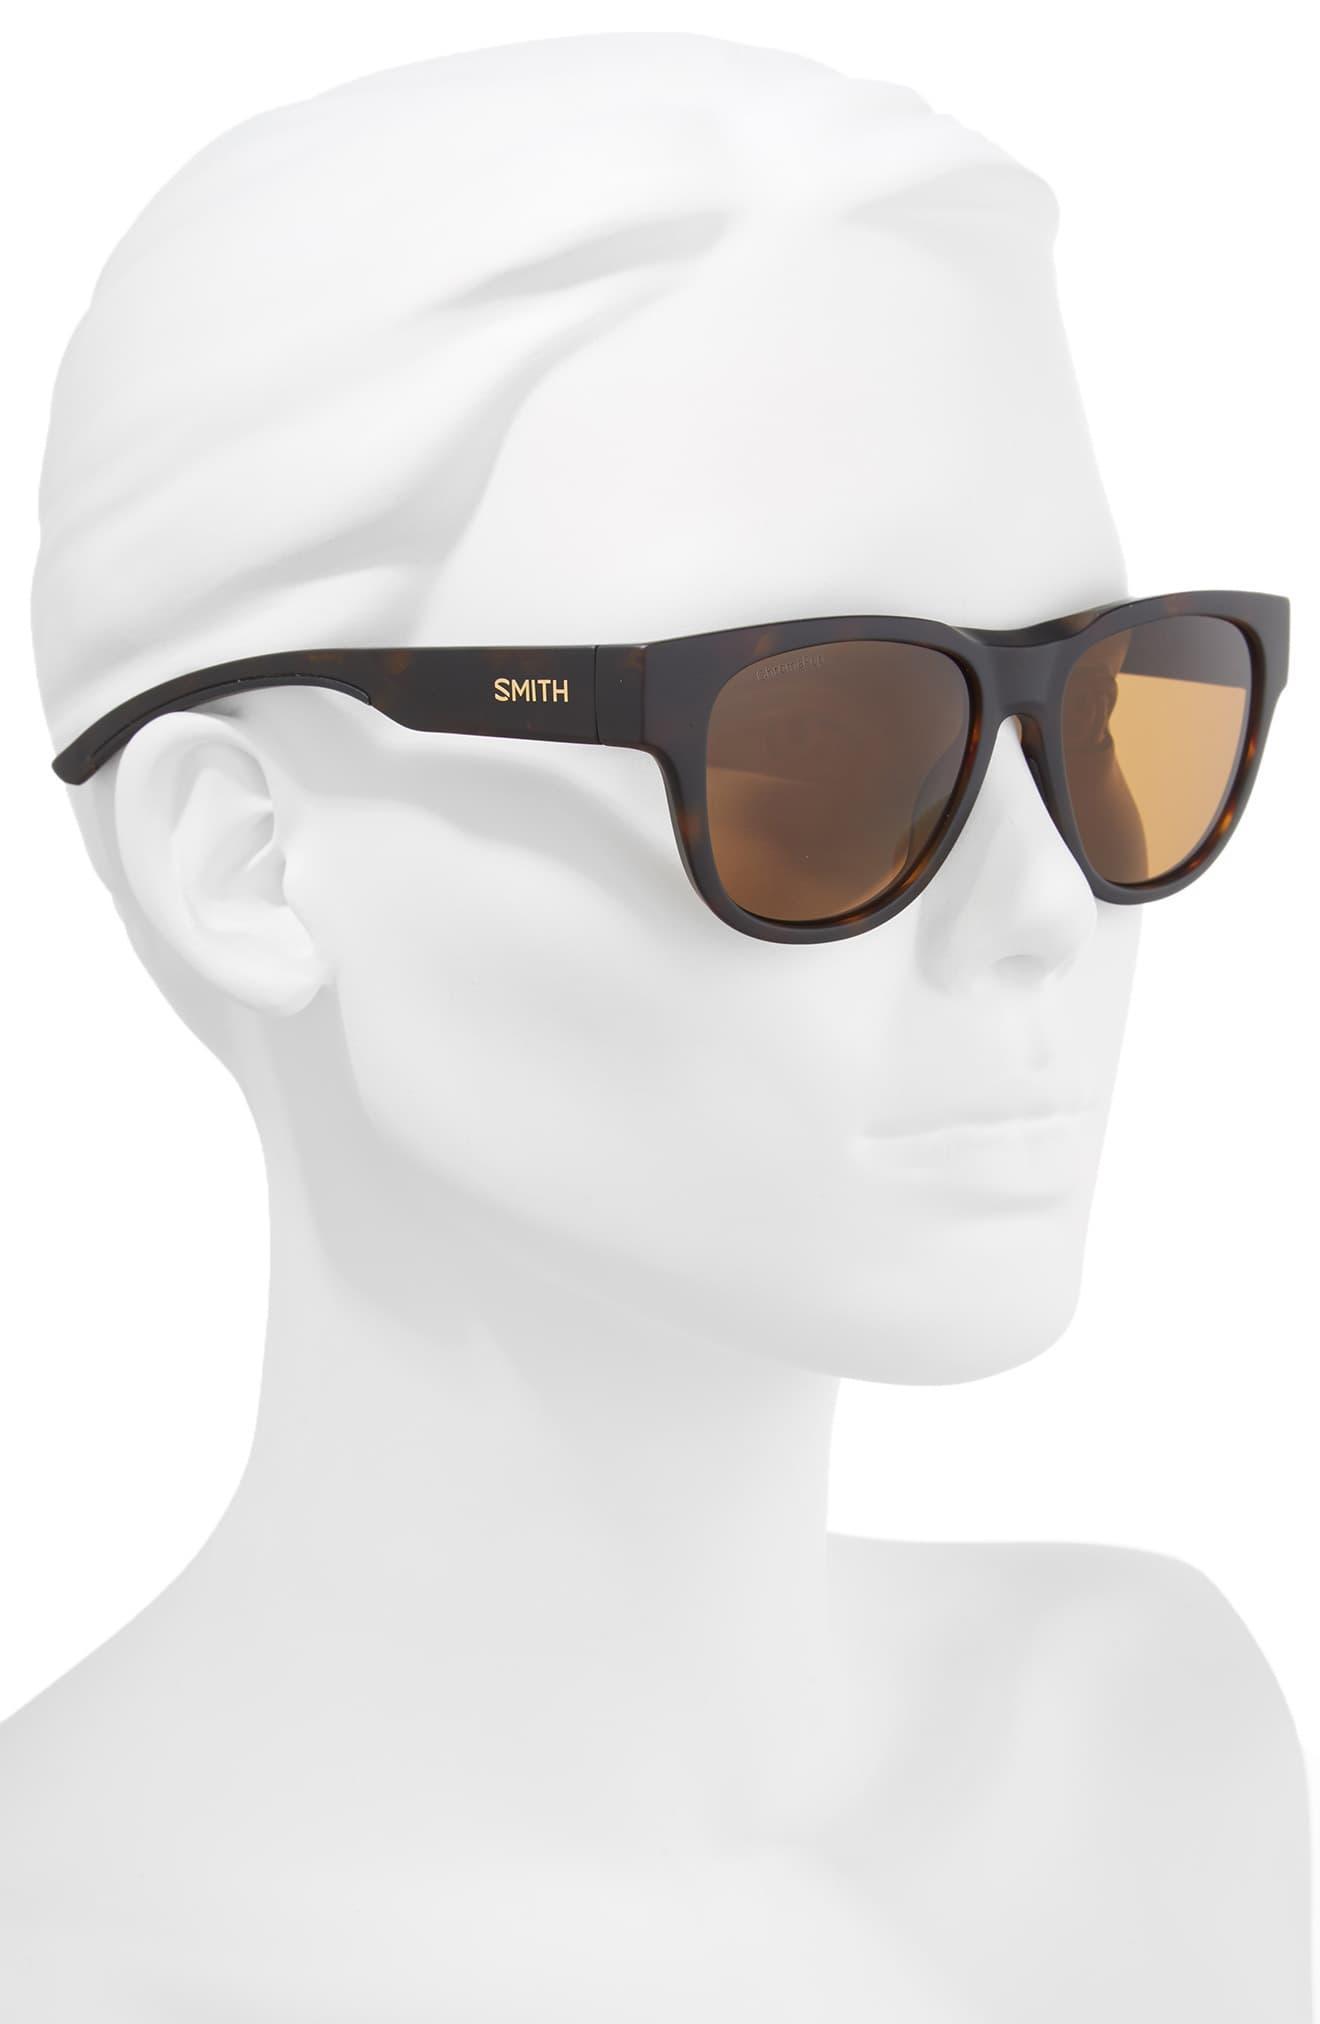 61d68f2563 Smith - Brown Rounder 52mm Chromapop Polarized Sunglasses - Lyst. View  fullscreen